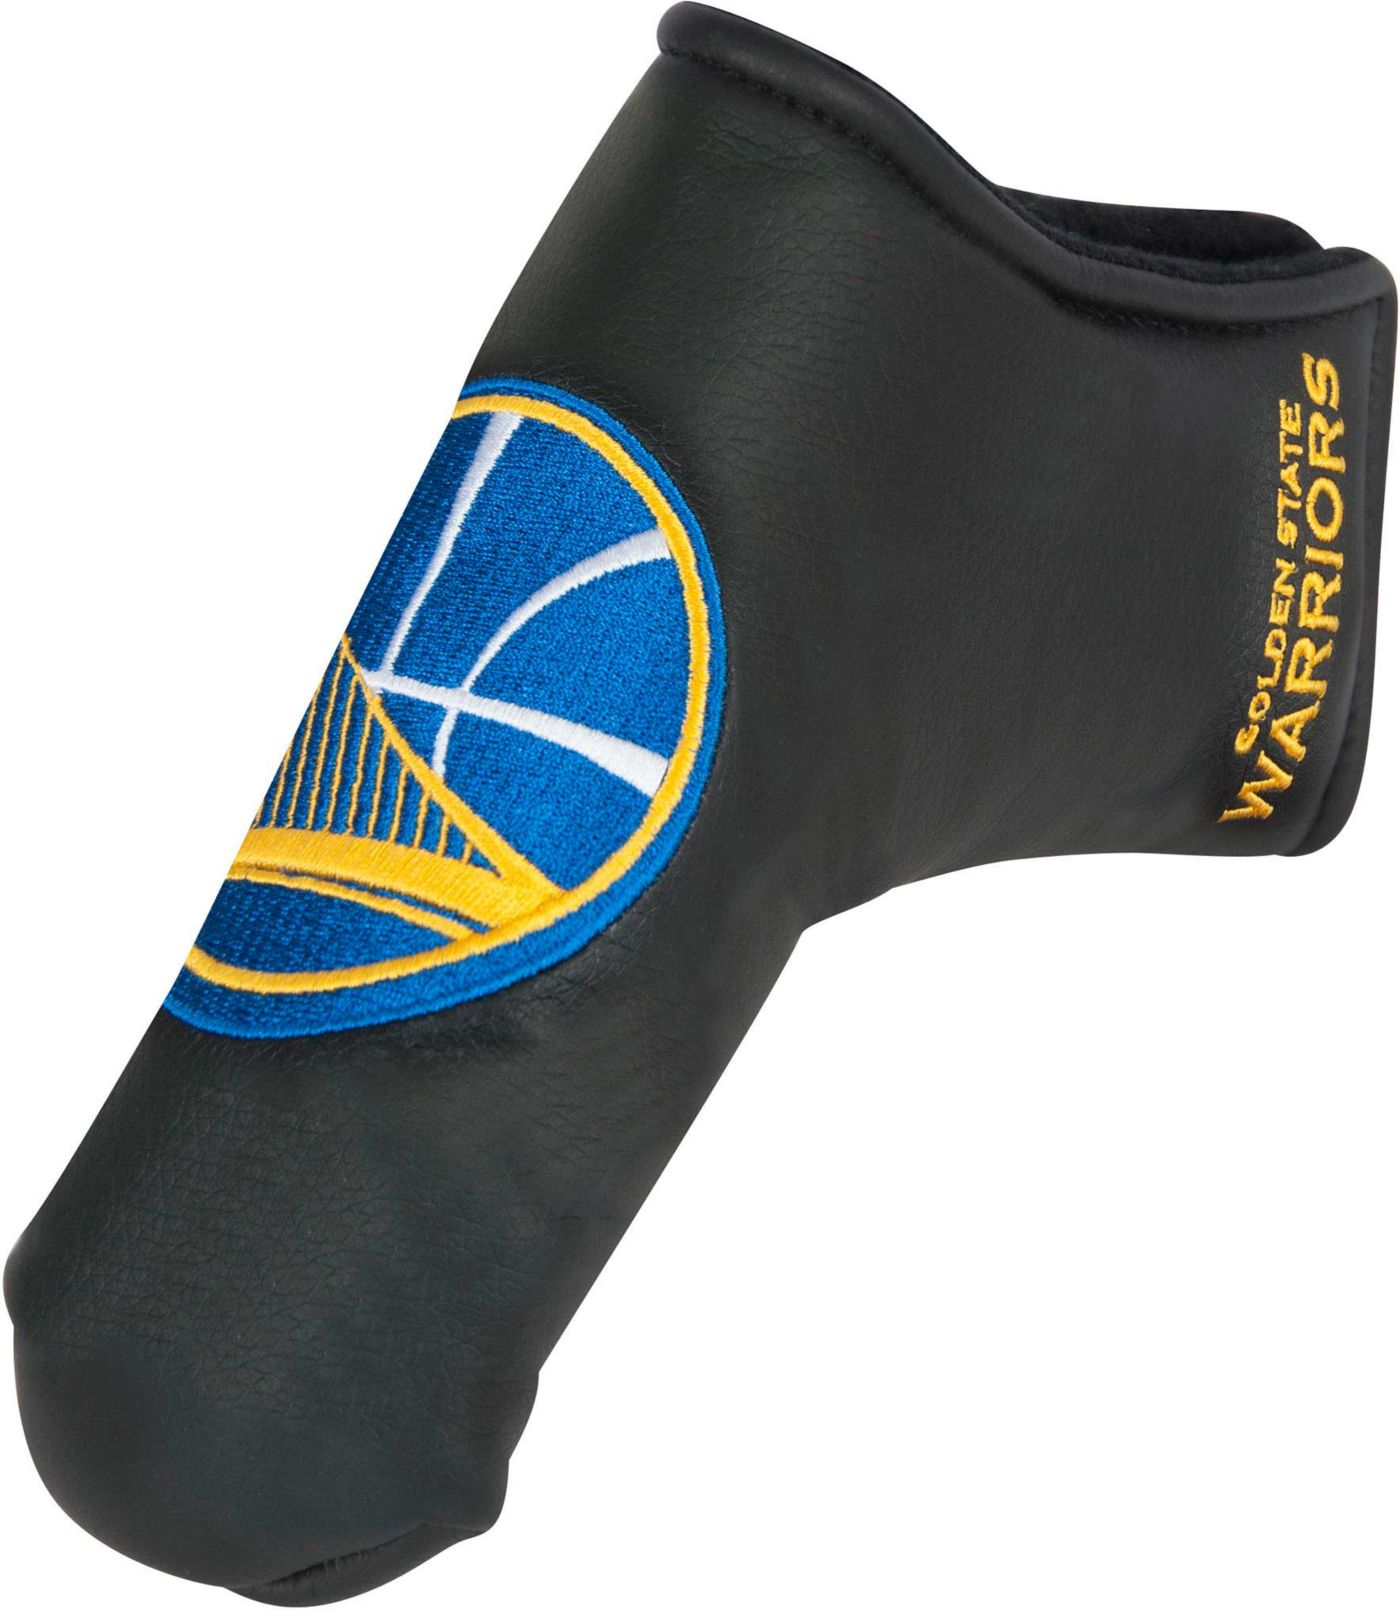 Team Effort Golden State Warriors Blade Putter Headcover